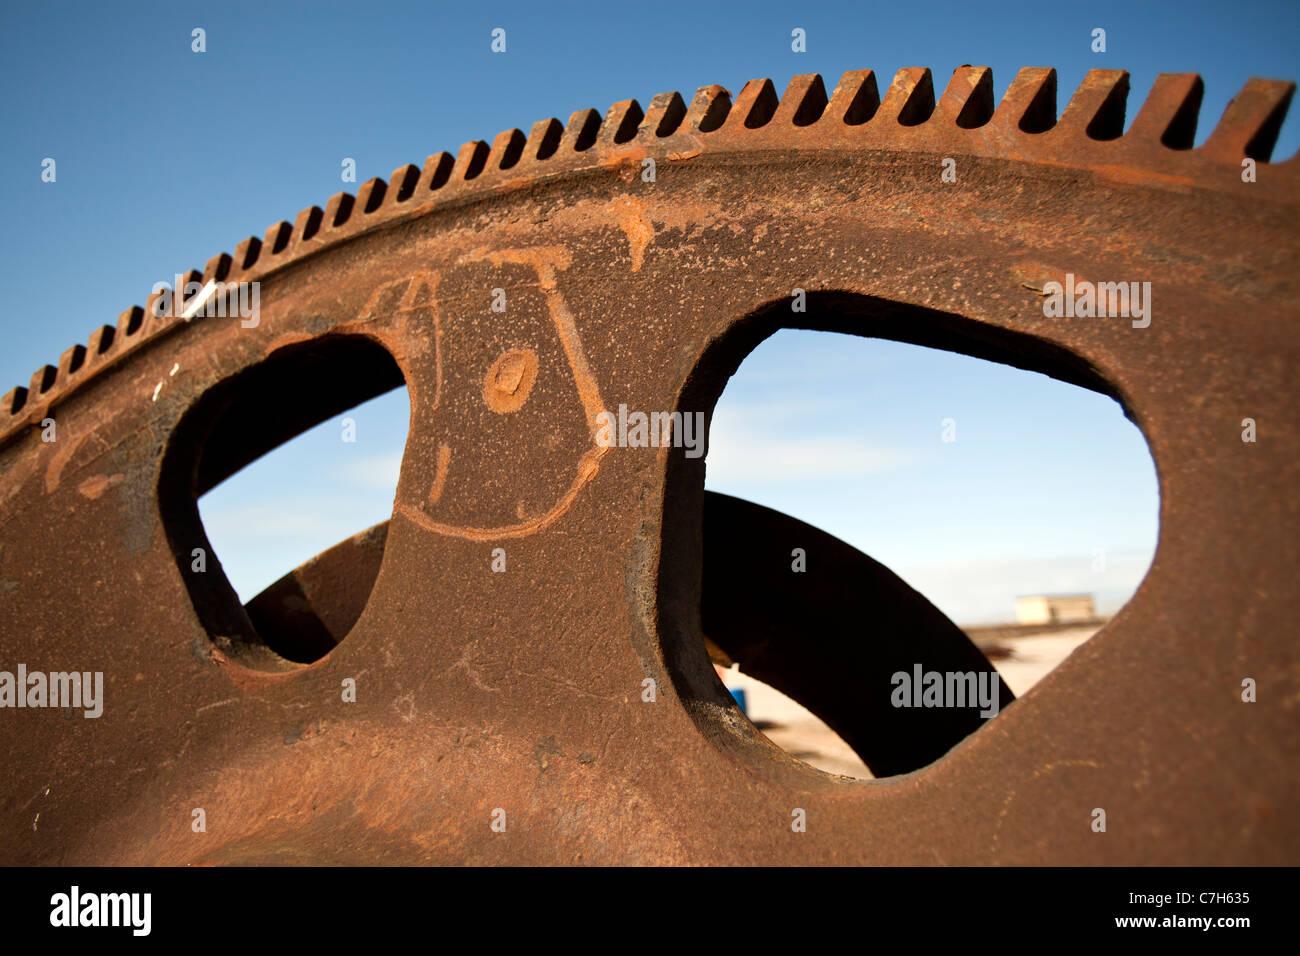 Teeth on a Rusty iron cog wheel against a blue sky. - Stock Image